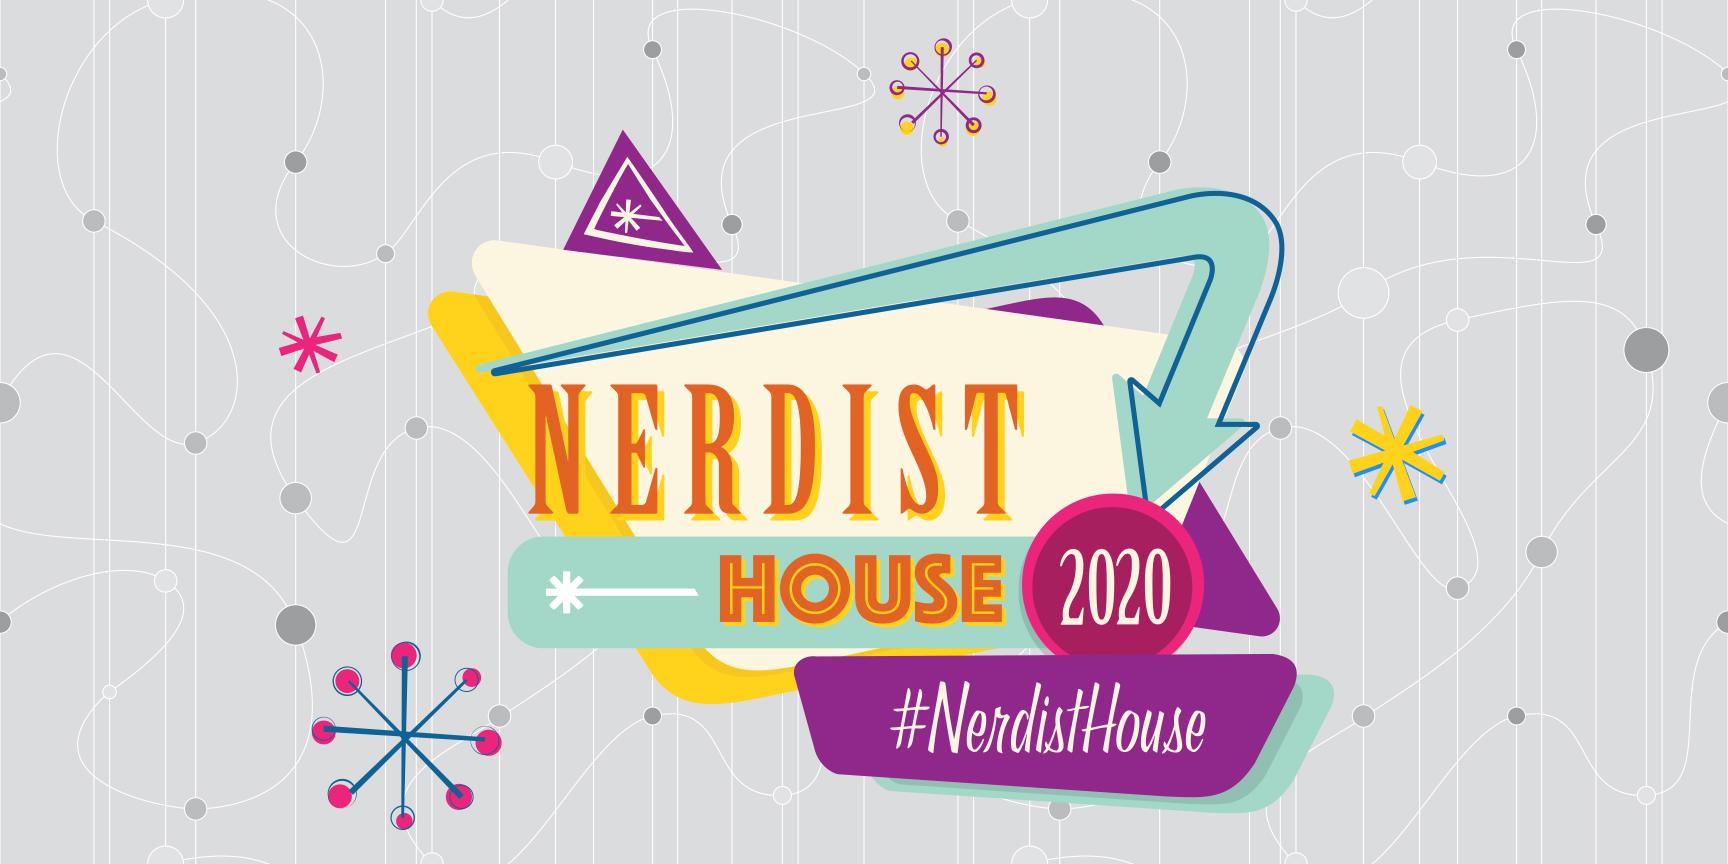 Nerdist House 2020